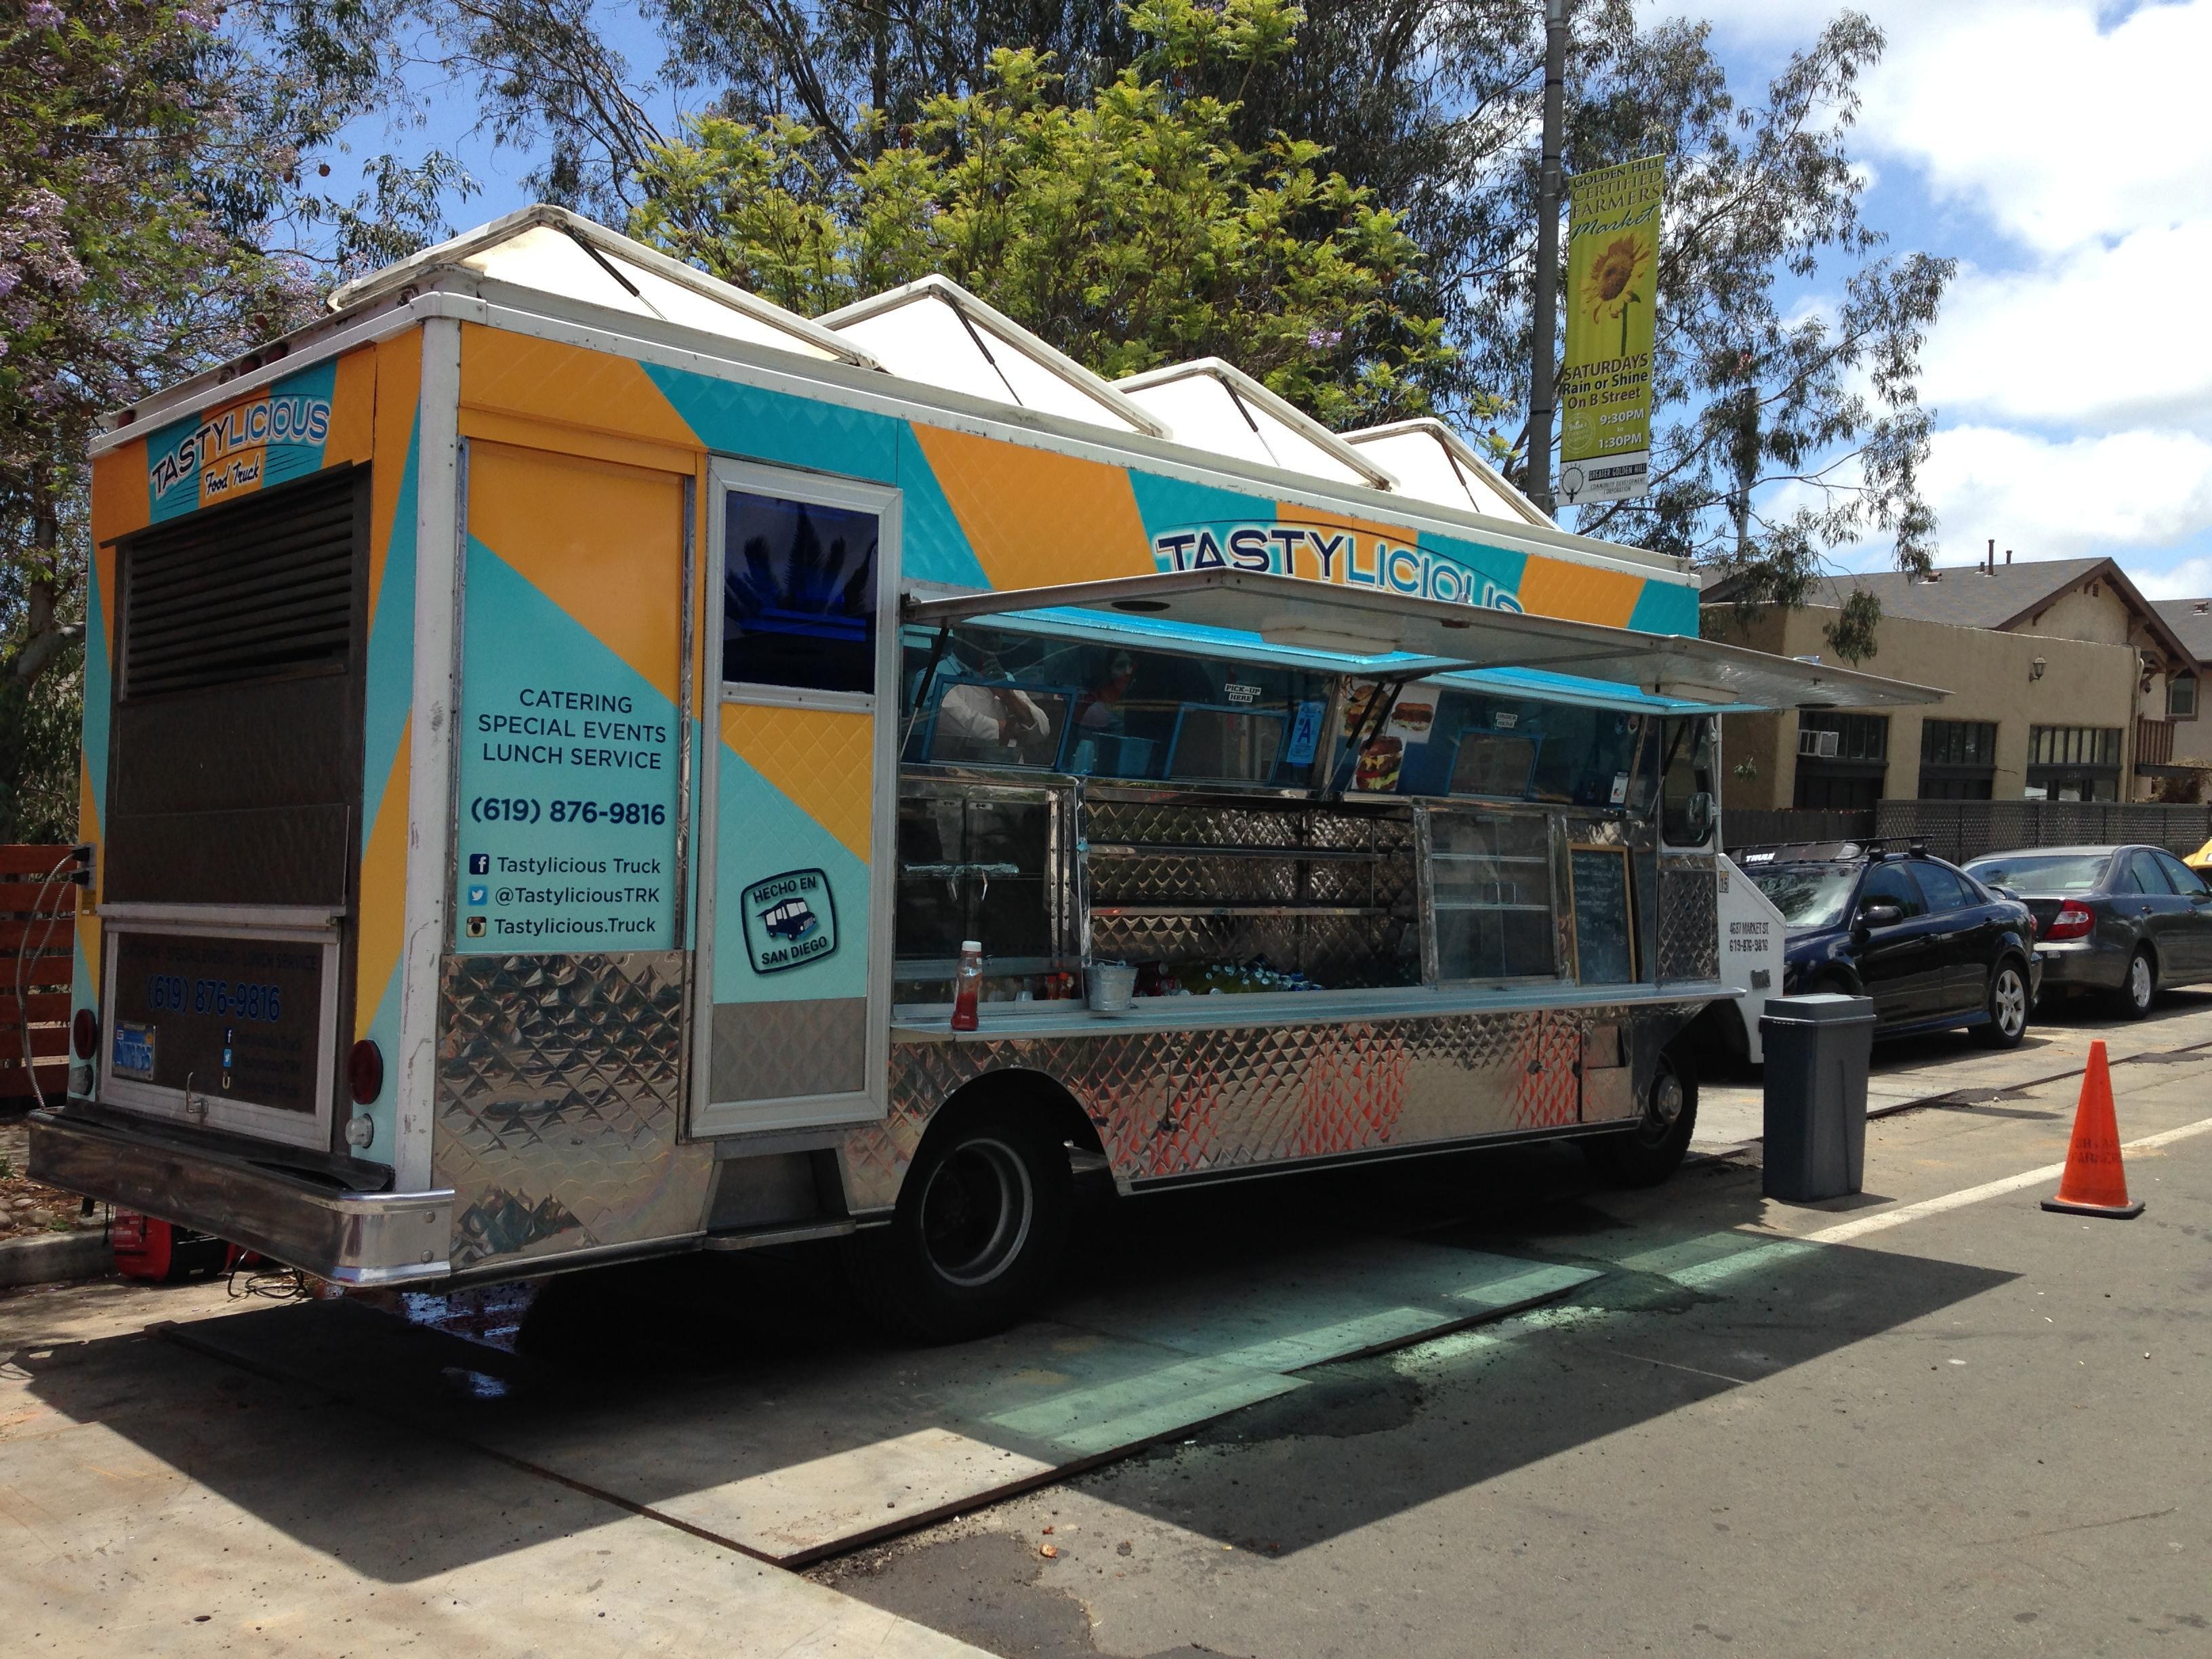 The humble Tastilicious food truck